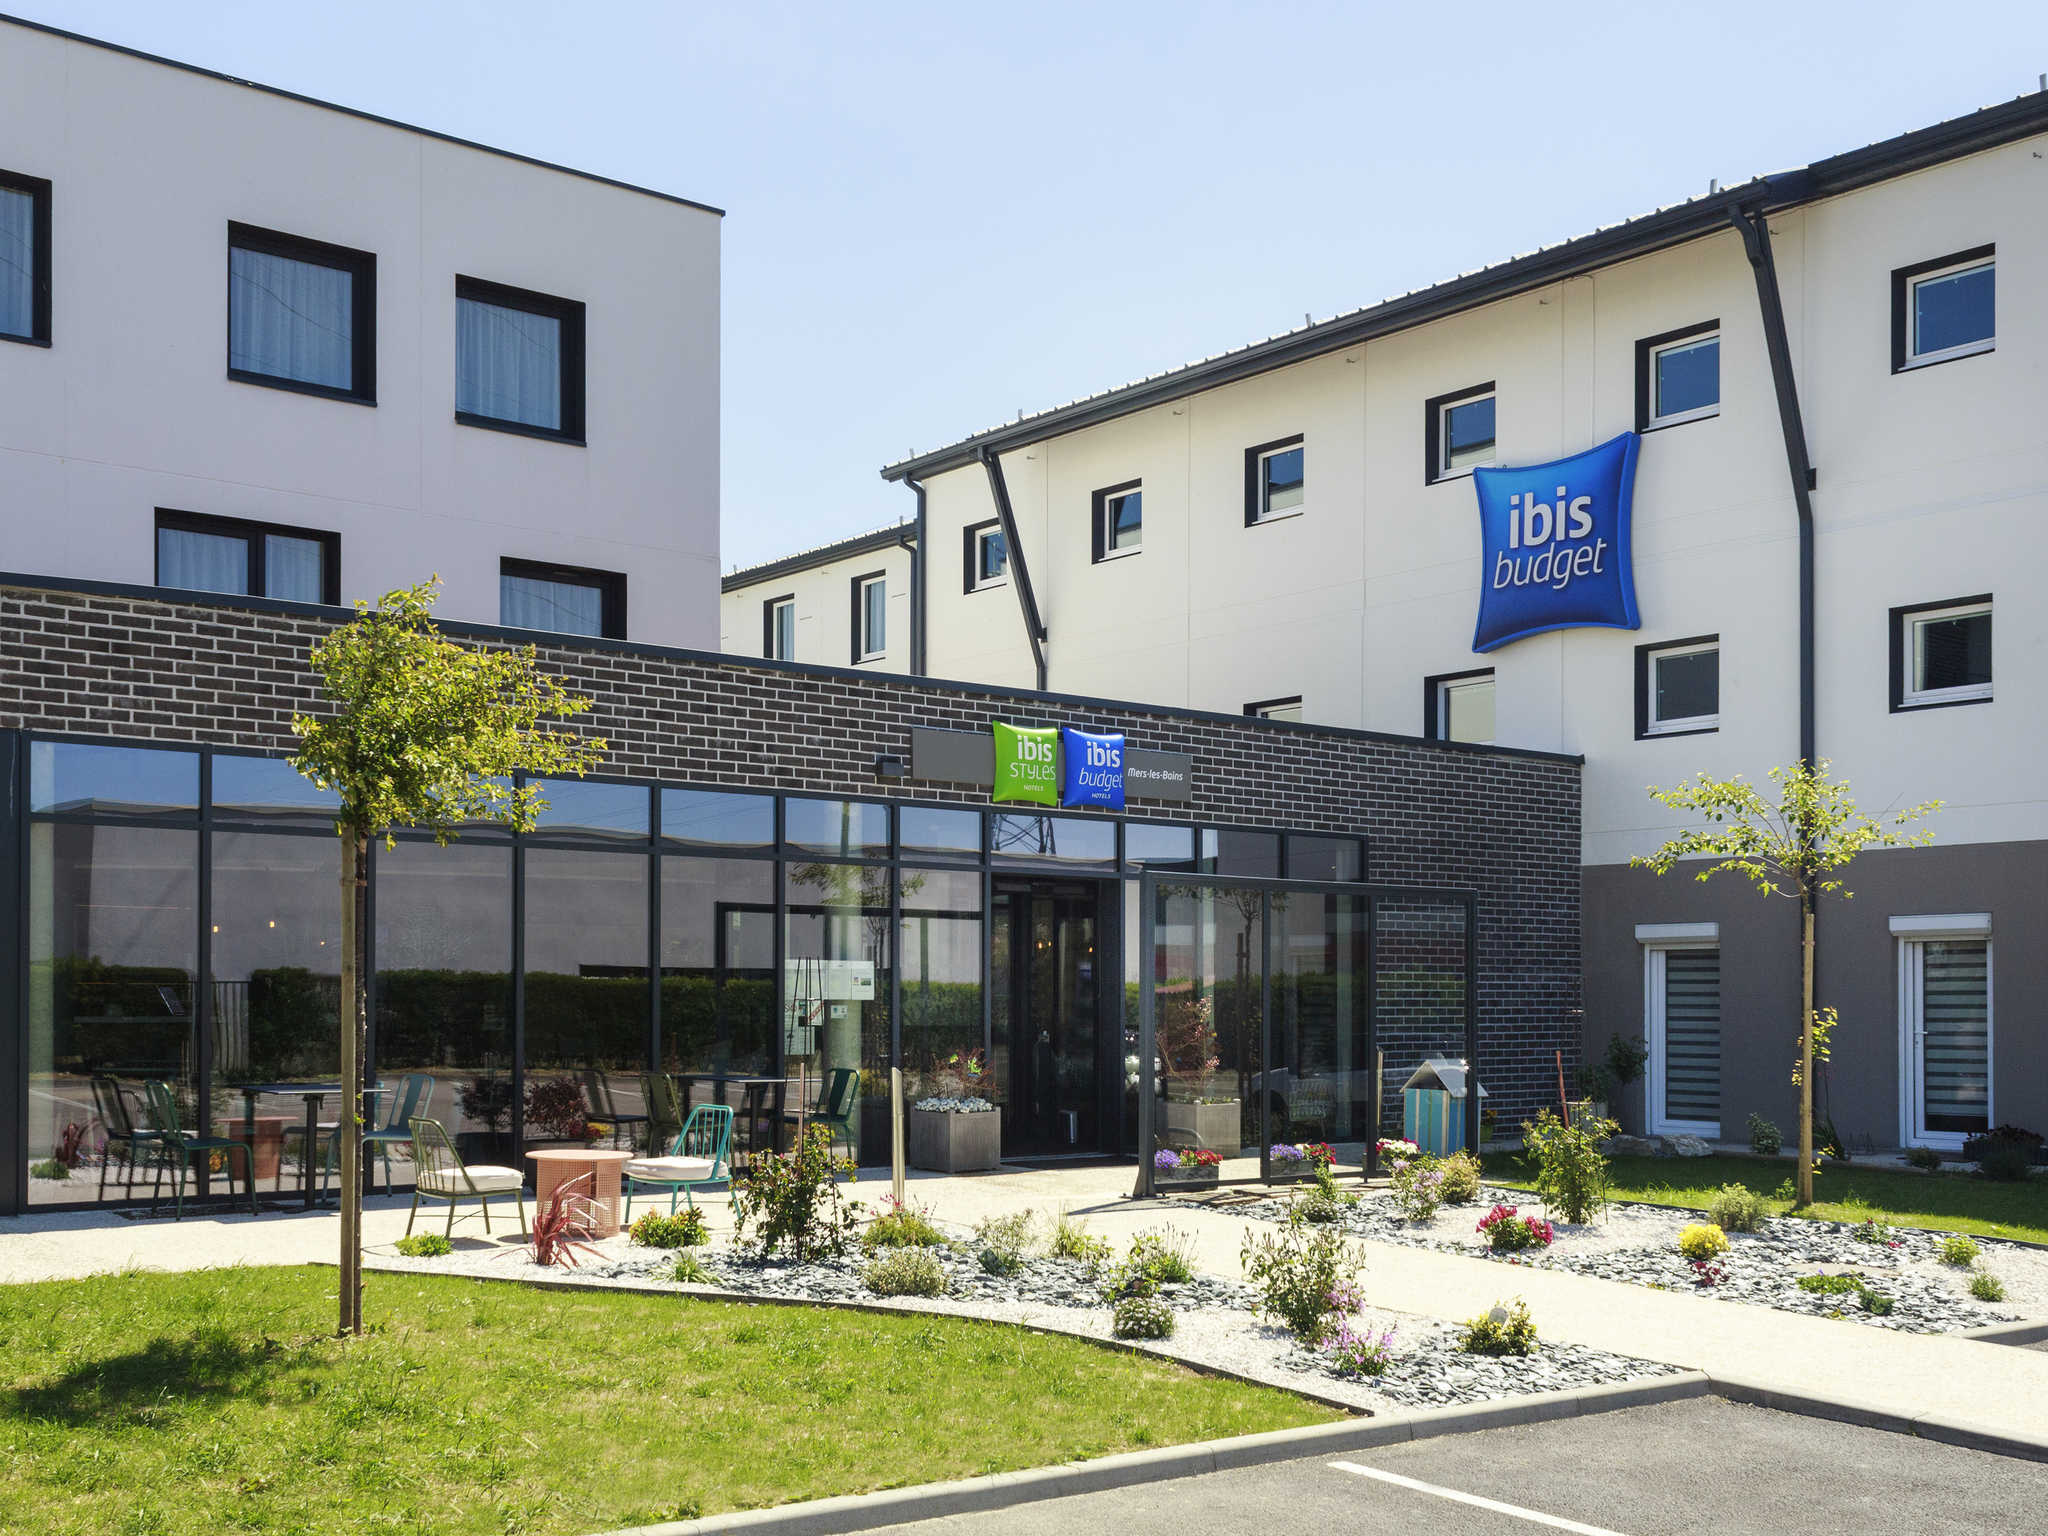 酒店 – ibis budget Le Tréport Mers-les-Bains